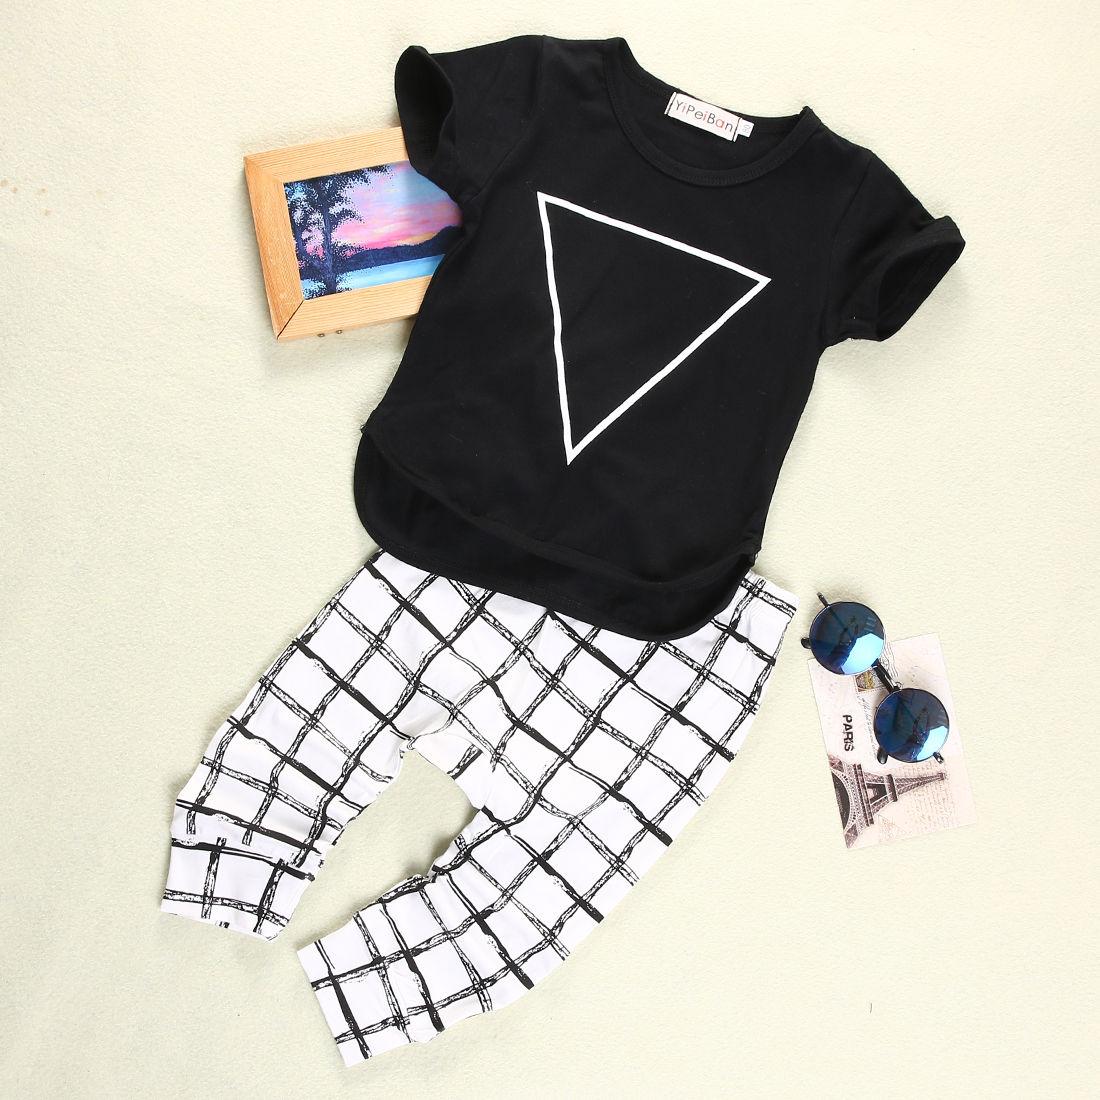 Black t shirt for babies - Toddler Infant Baby Boy Girls Kid Short Sleeve Black T Shirt Tops Checked Pants